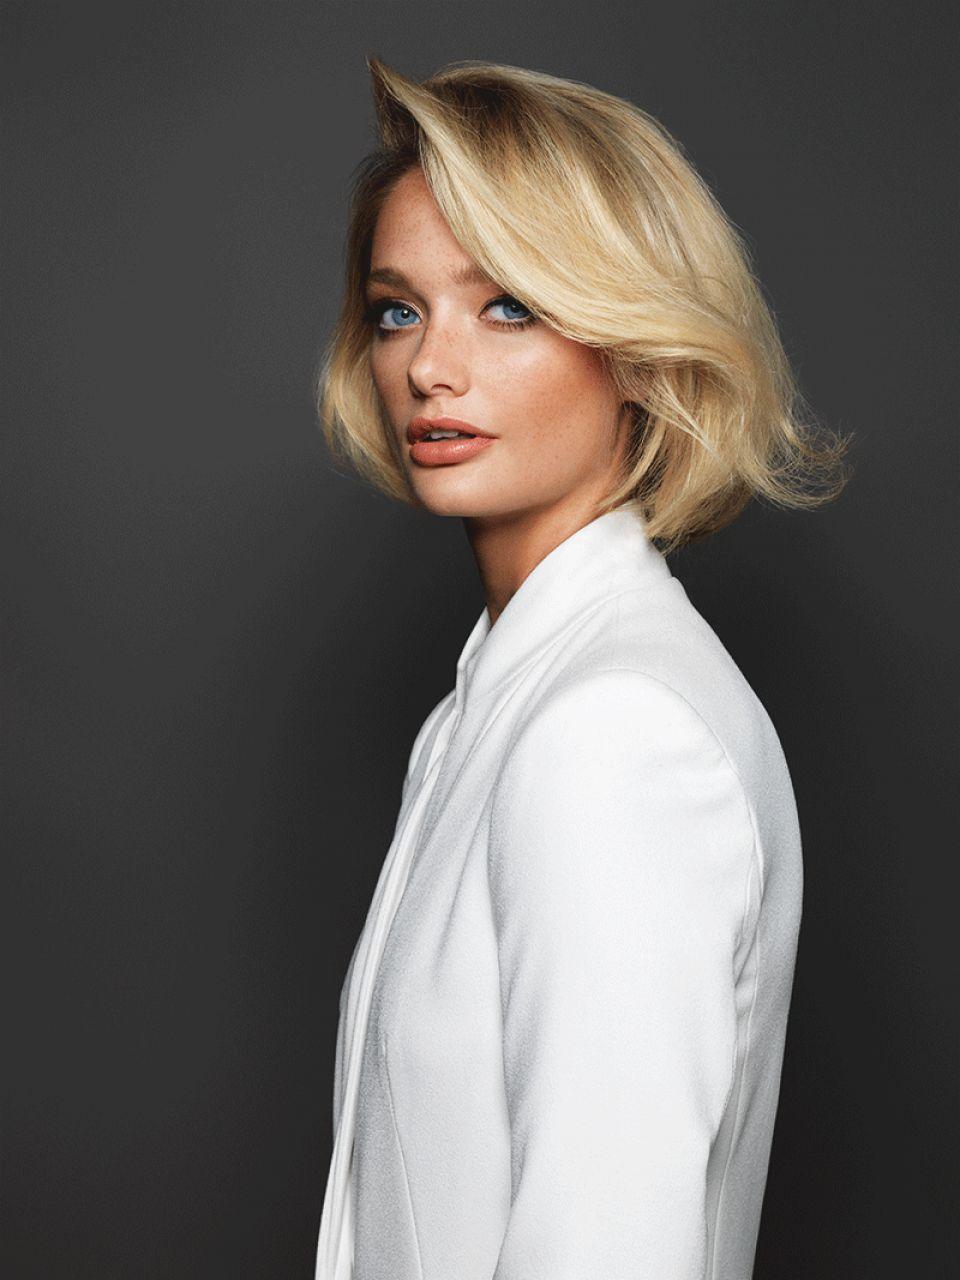 Kurze wellige Haare Damen  Friseurcom